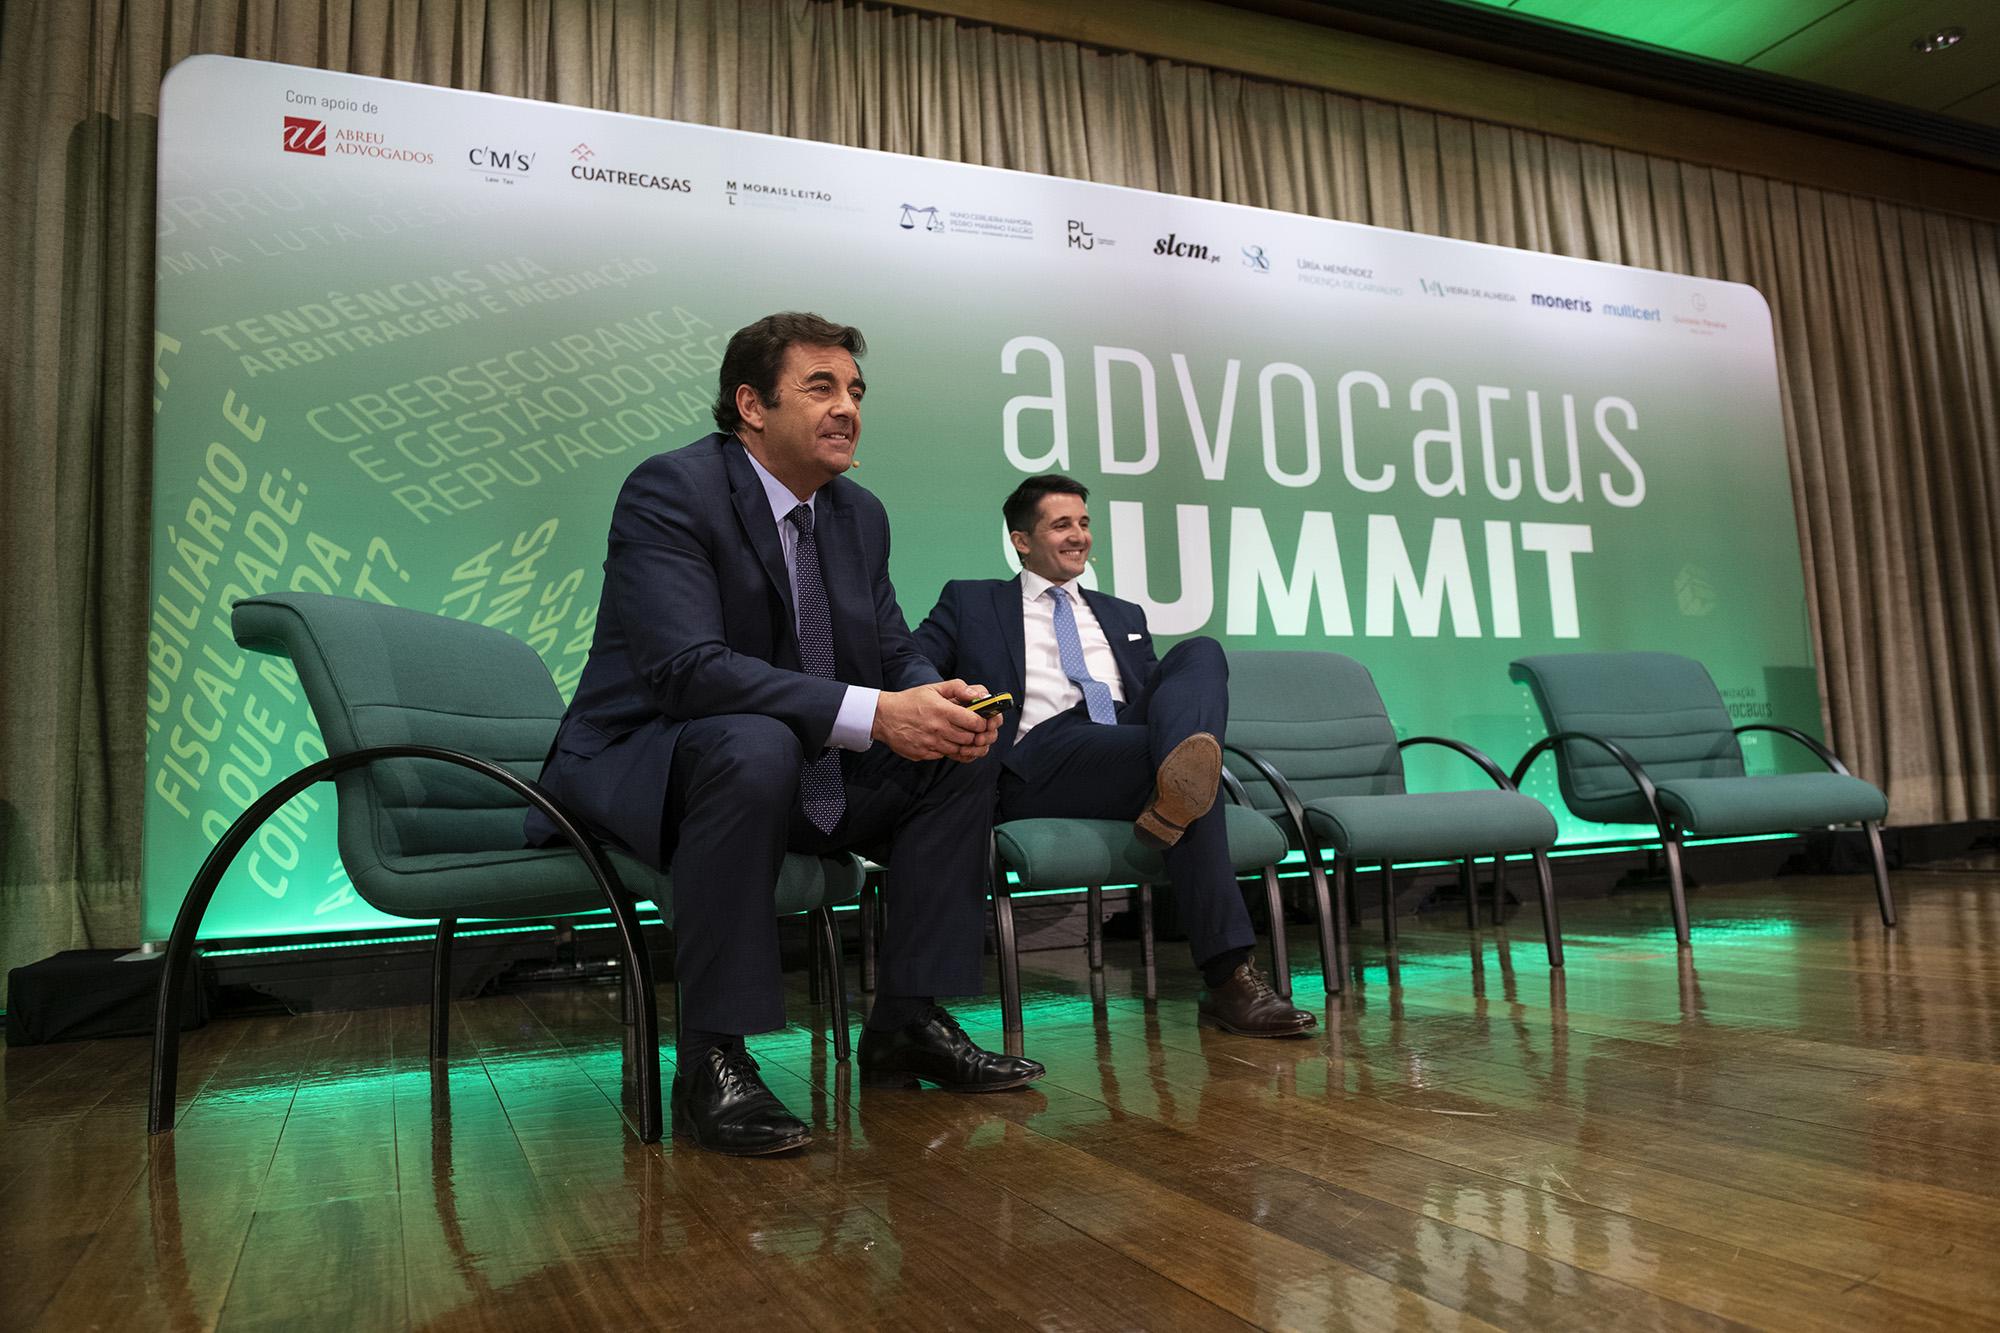 Advocatus Summit 2019 - 28MAI19